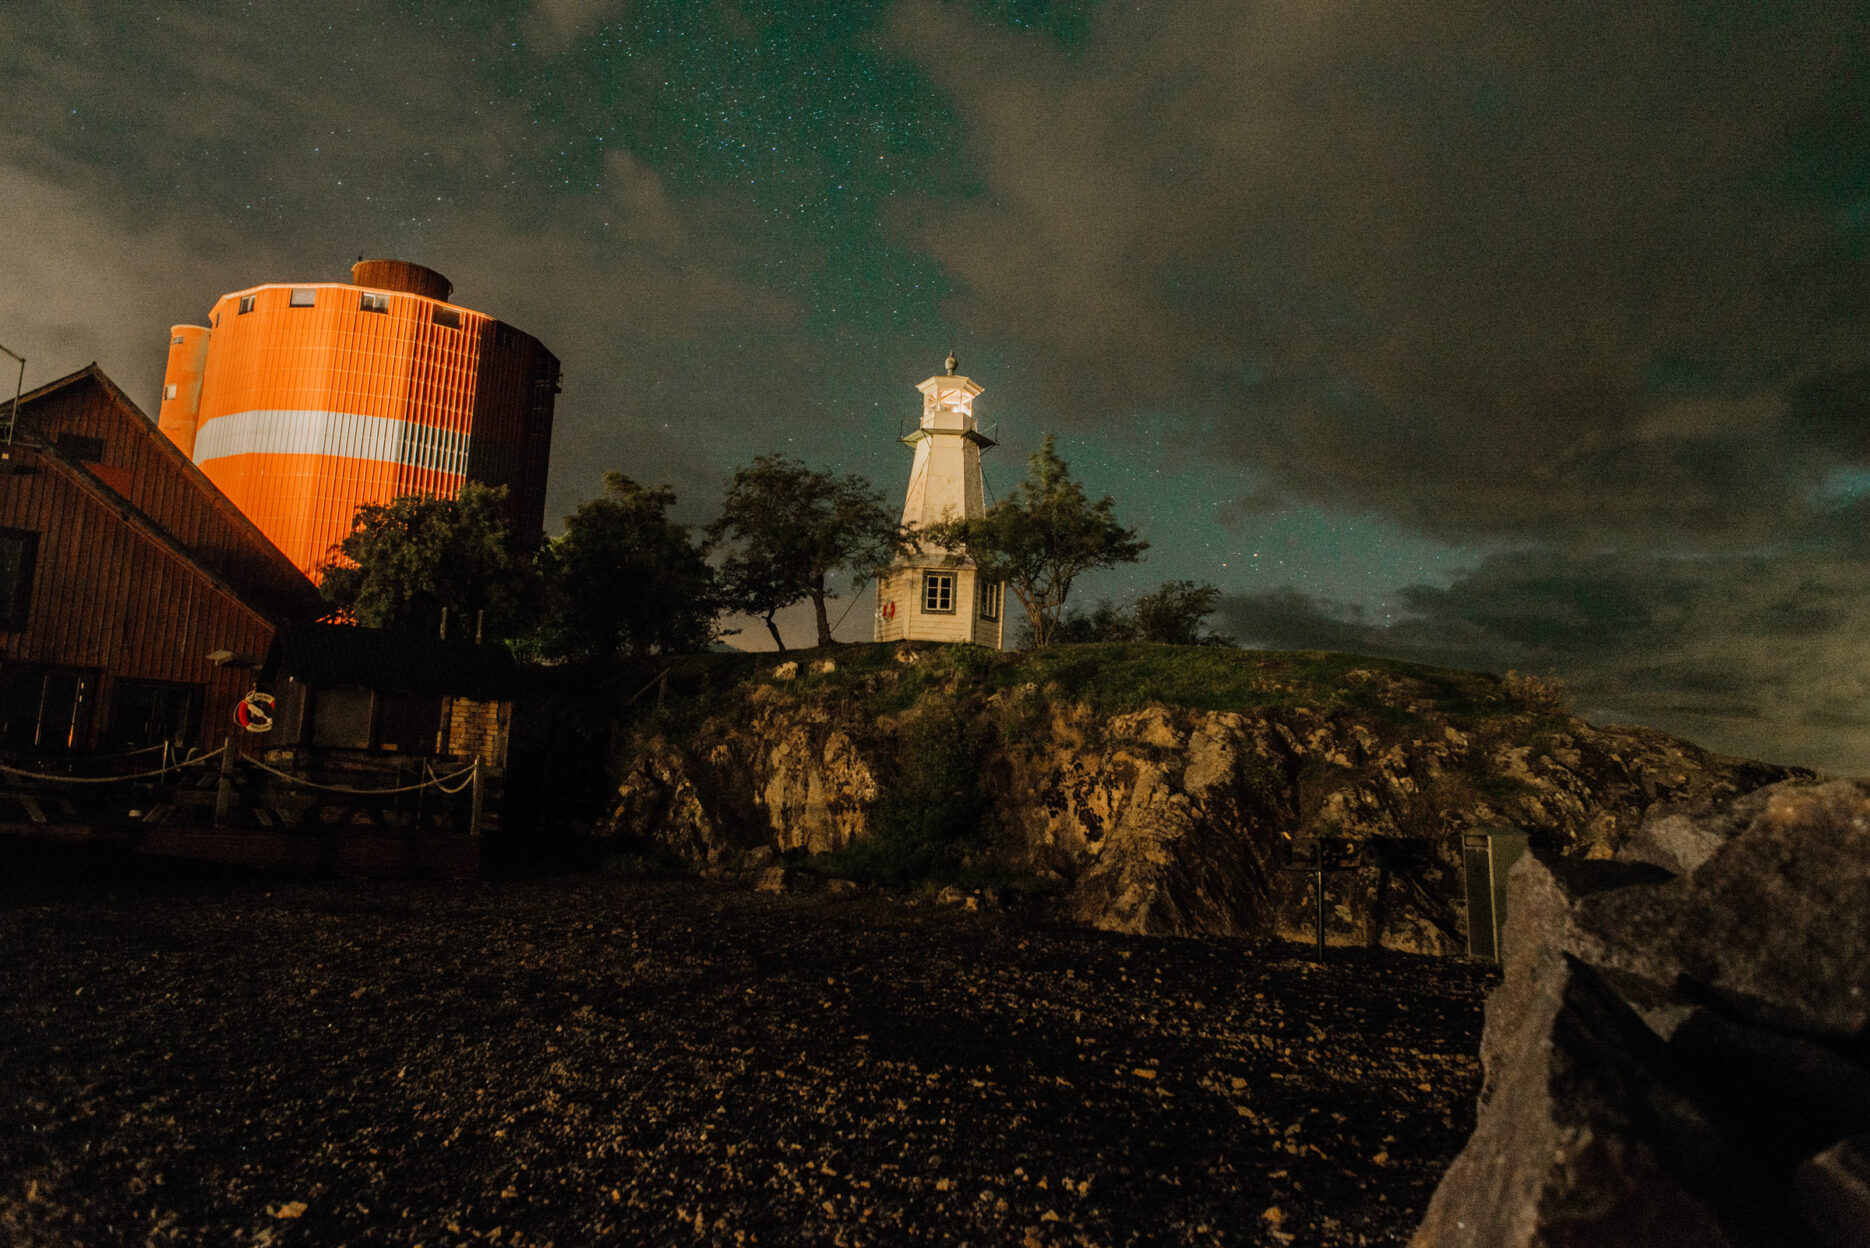 A silo and a lighthouse beneath a starry sky